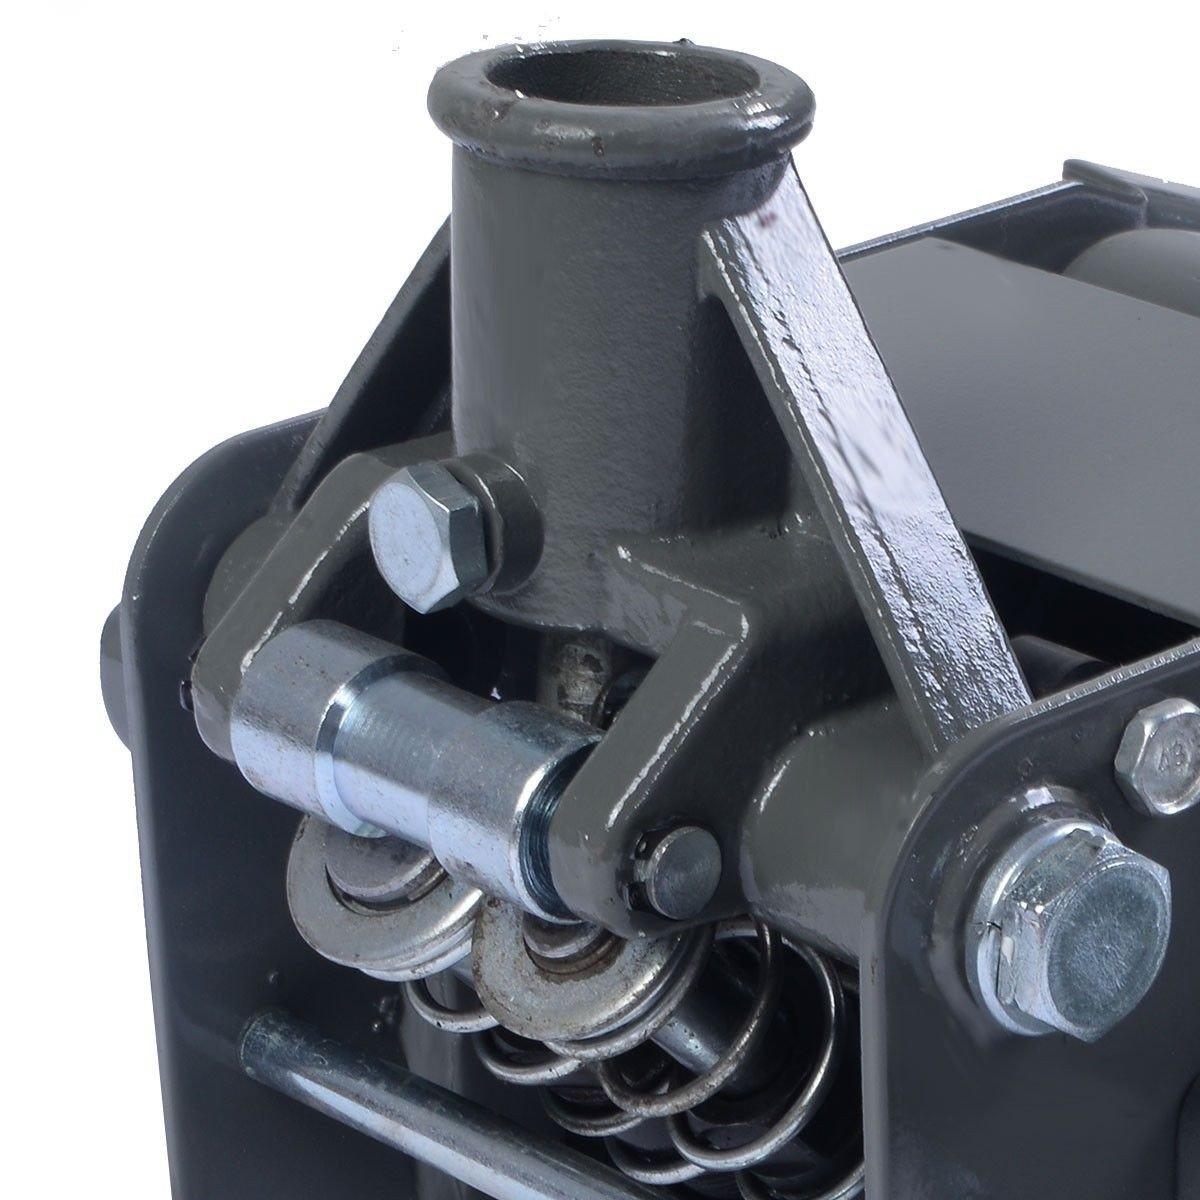 Heavy Duty Low Profile Floor 3 Ton Jack Steel Ultra Rapid Pump Car Pump Lowrider by Apontus (Image #4)